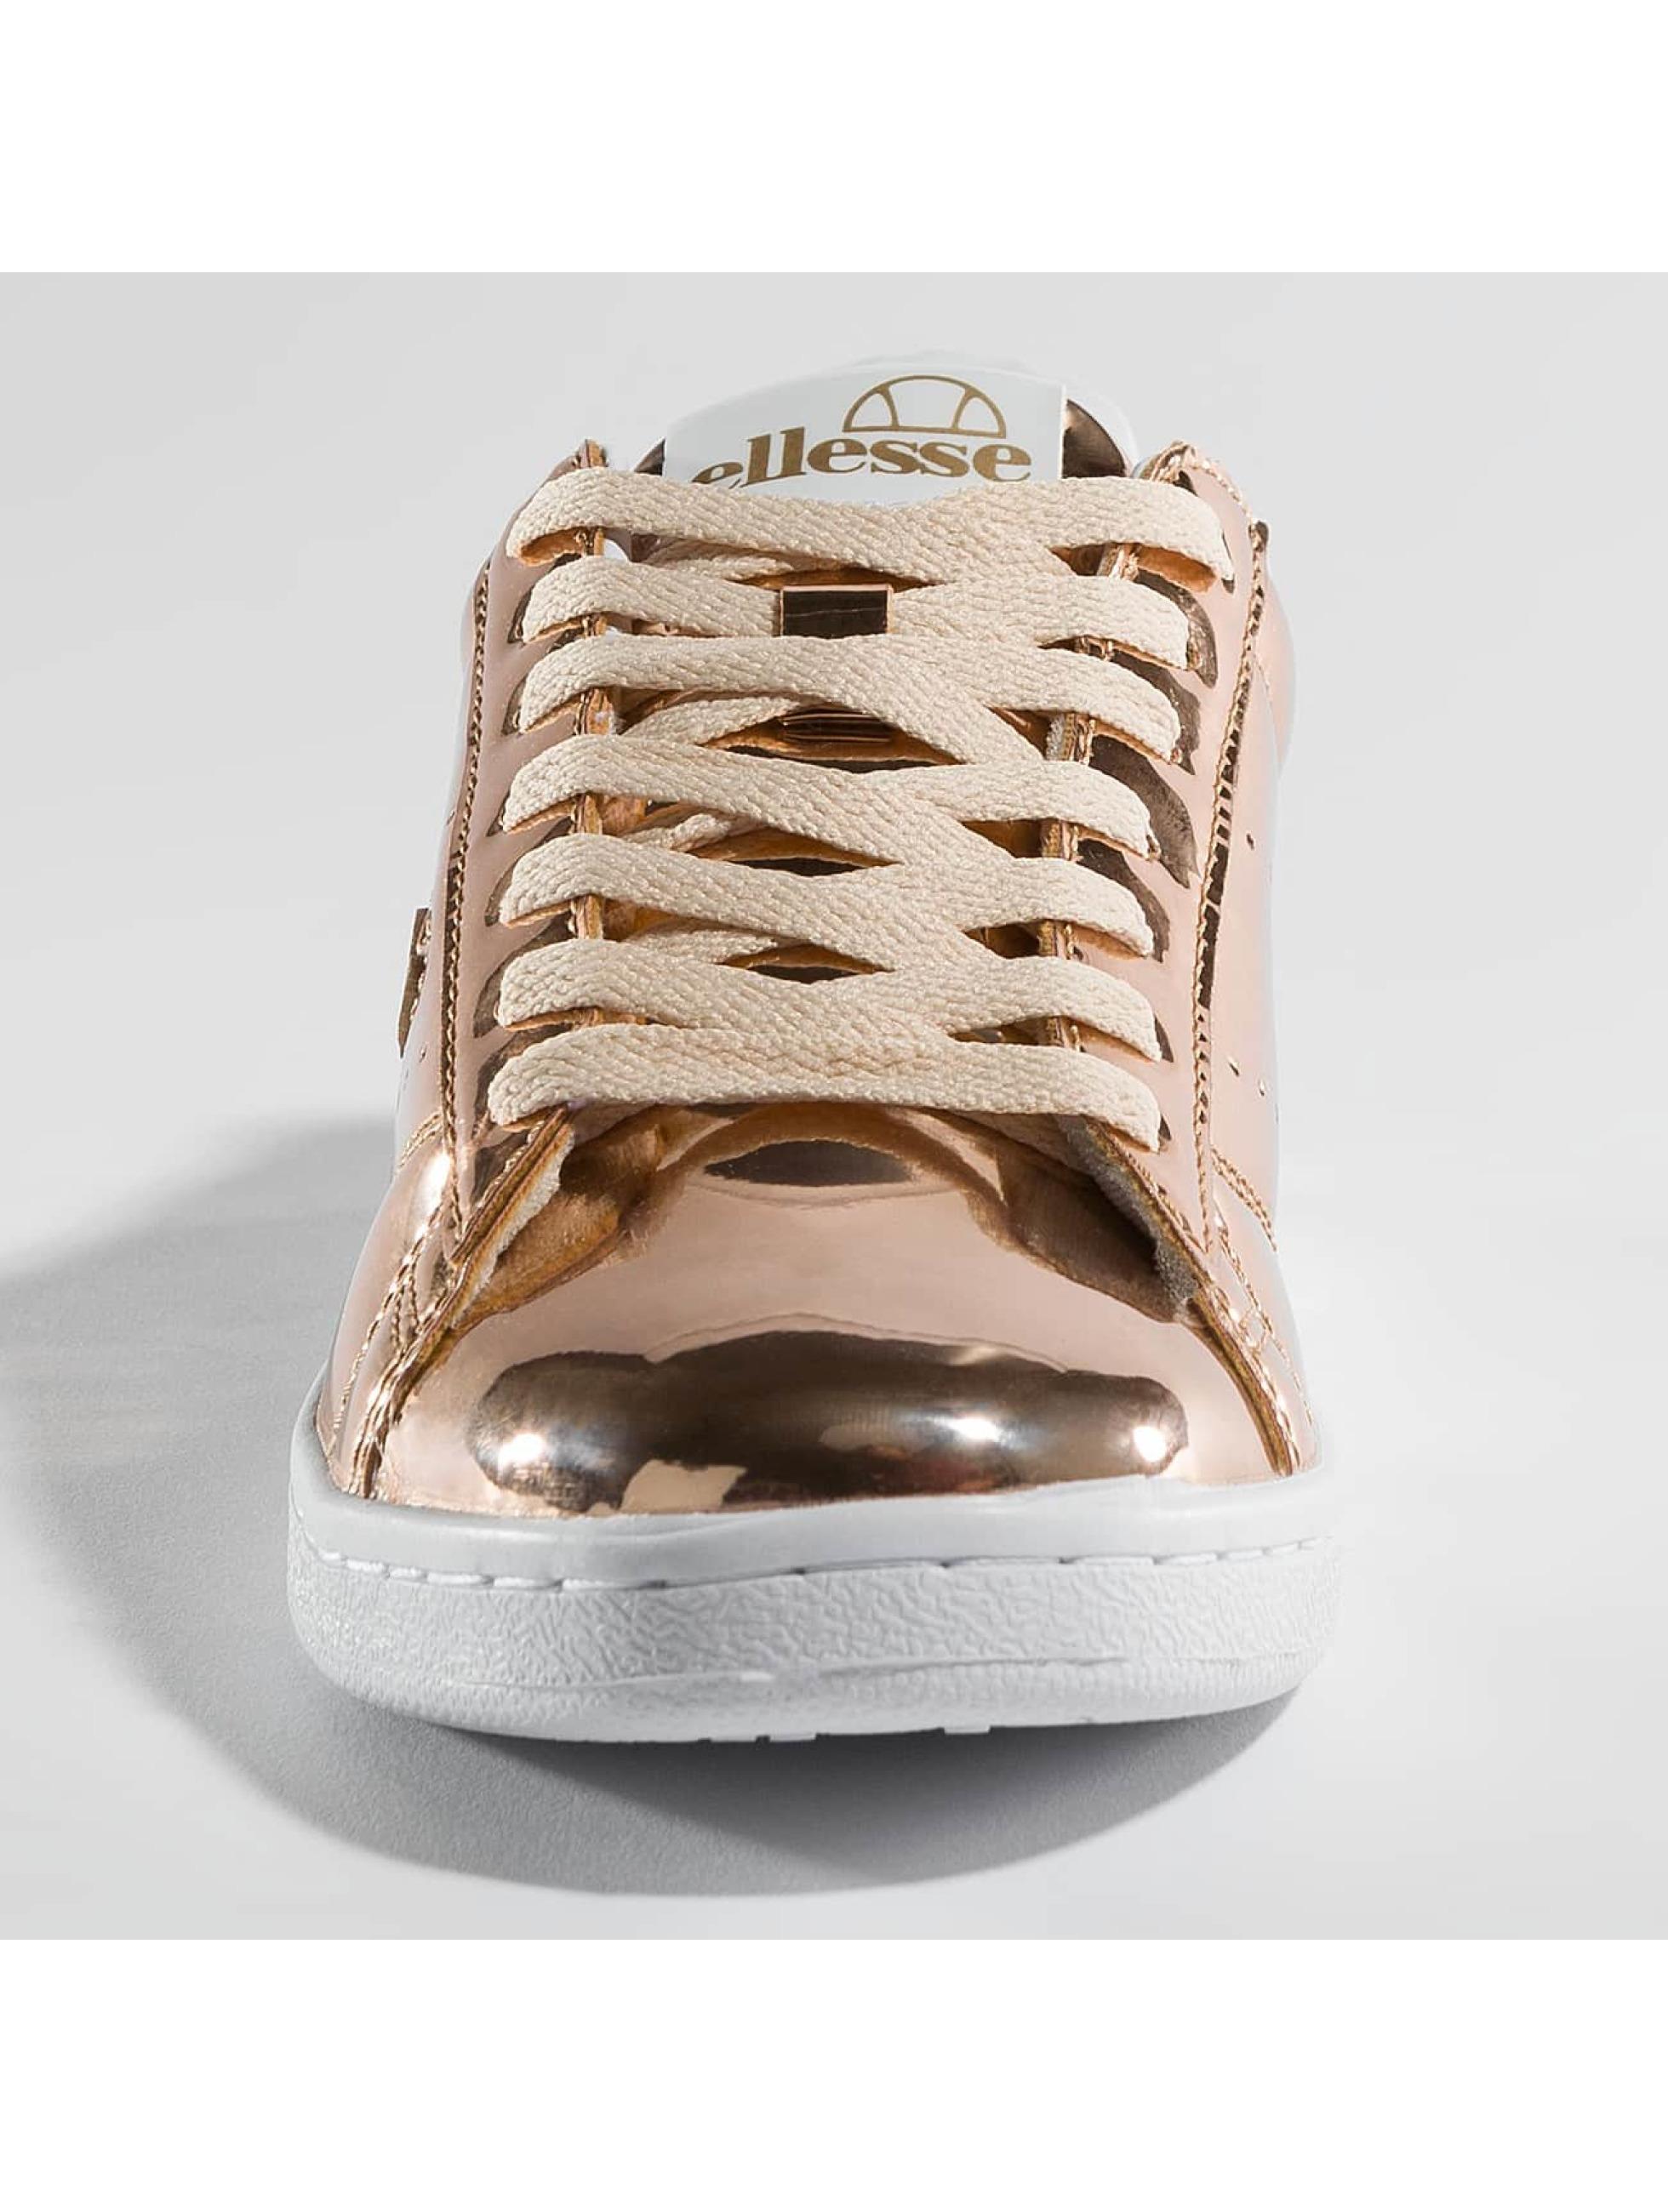 Ellesse Sneaker Heritage Anzia Metallic goldfarben